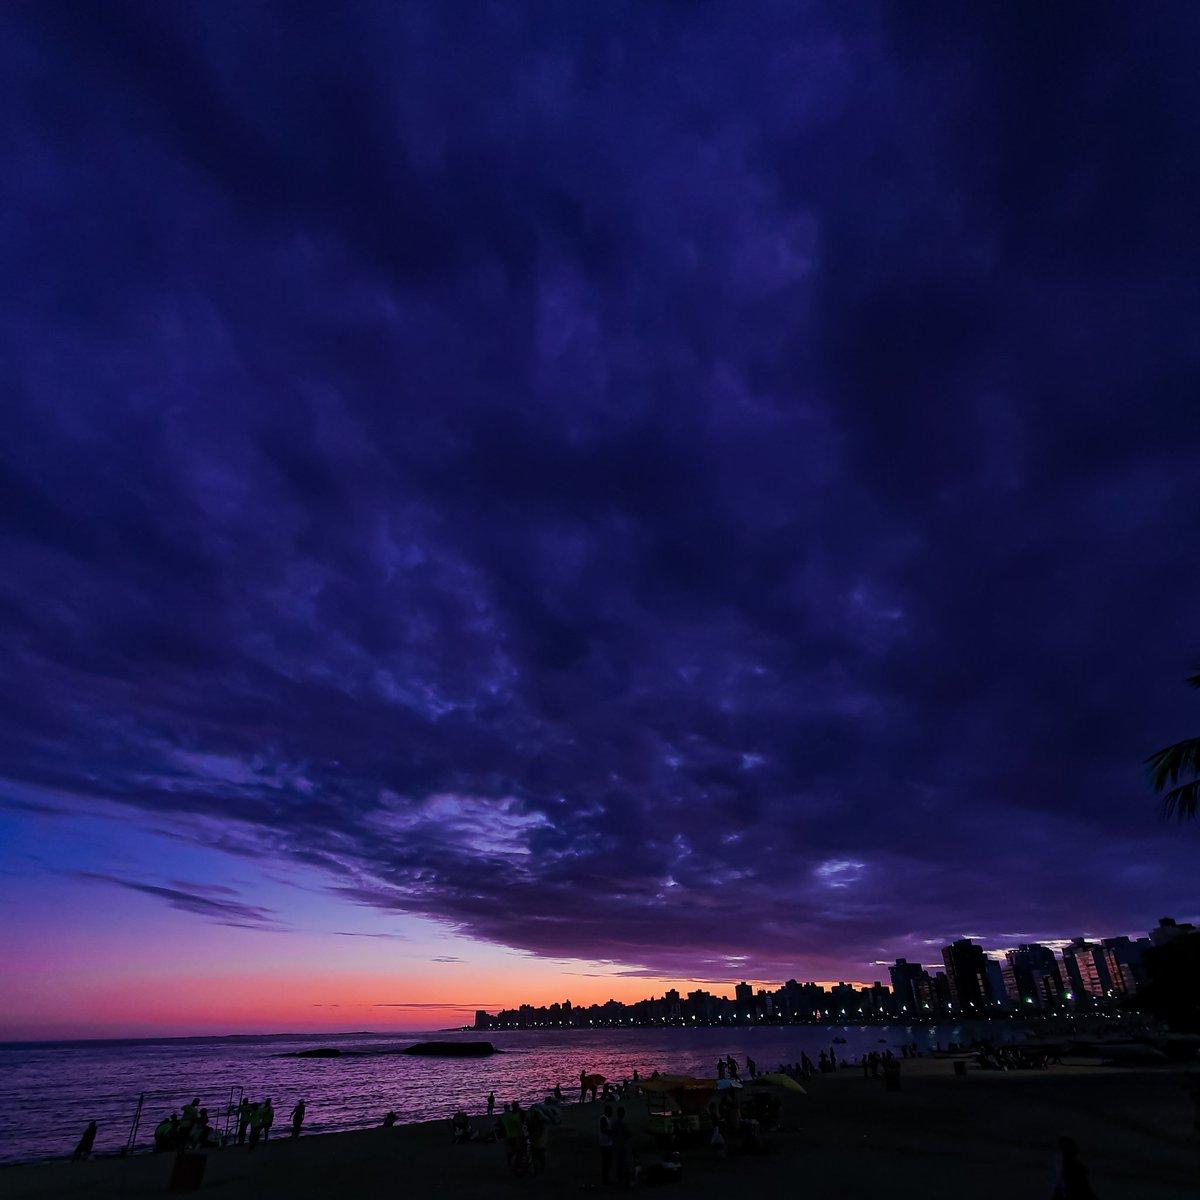 ÚLTIMO SÁBADO DE 2019! VEEEEM  #praiadacosta #sunrisepic.twitter.com/RtB9E0U5mU